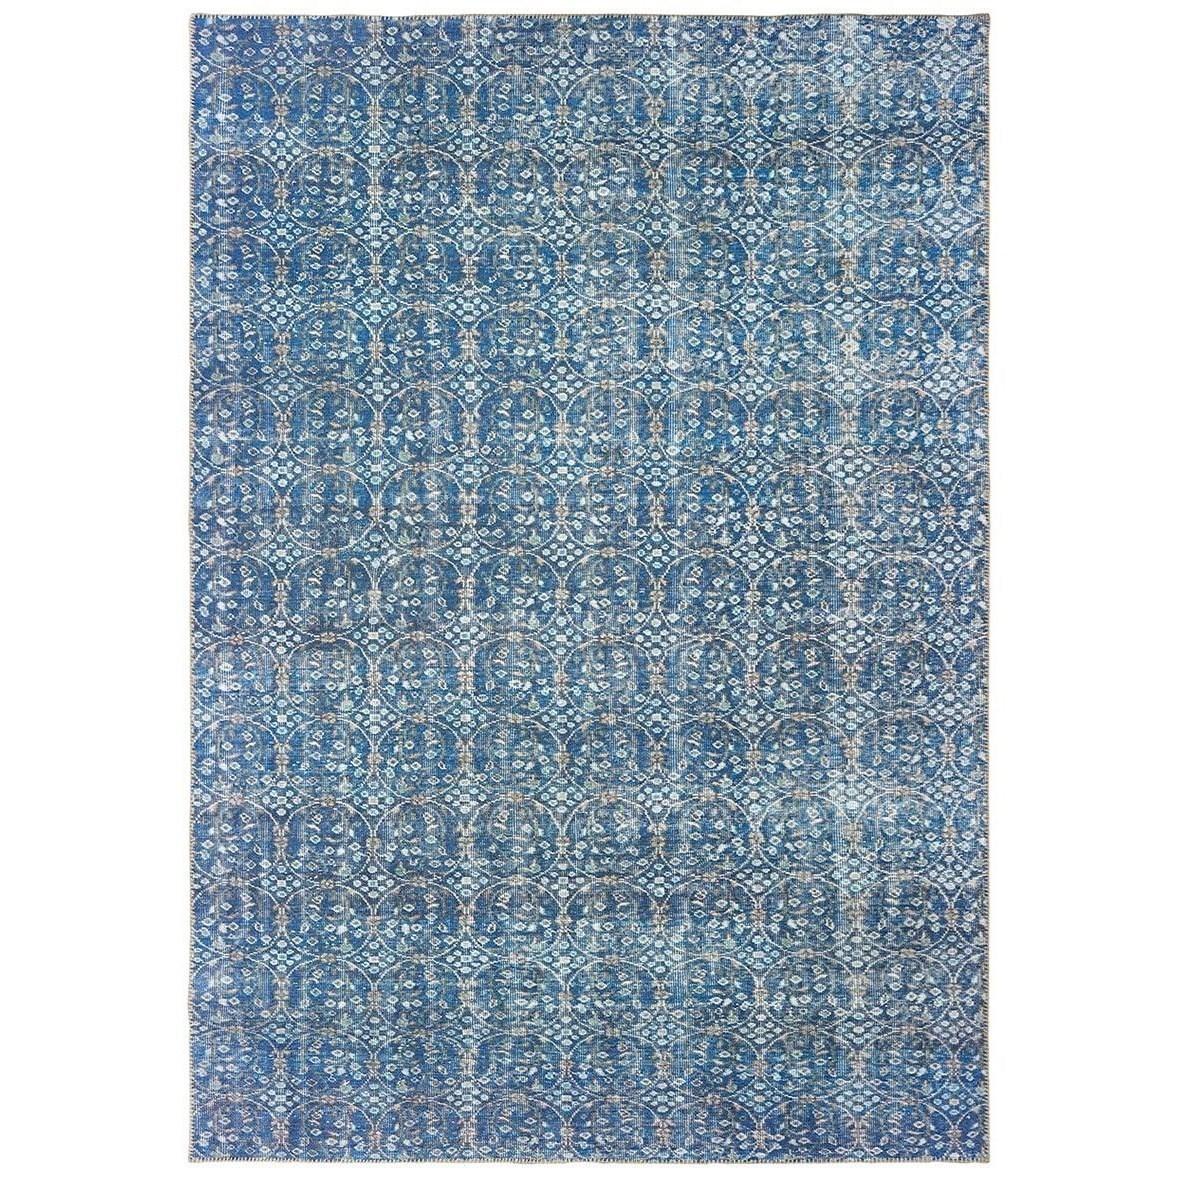 Sofia 8' 3 X 11' 6 Rug by Oriental Weavers at HomeWorld Furniture